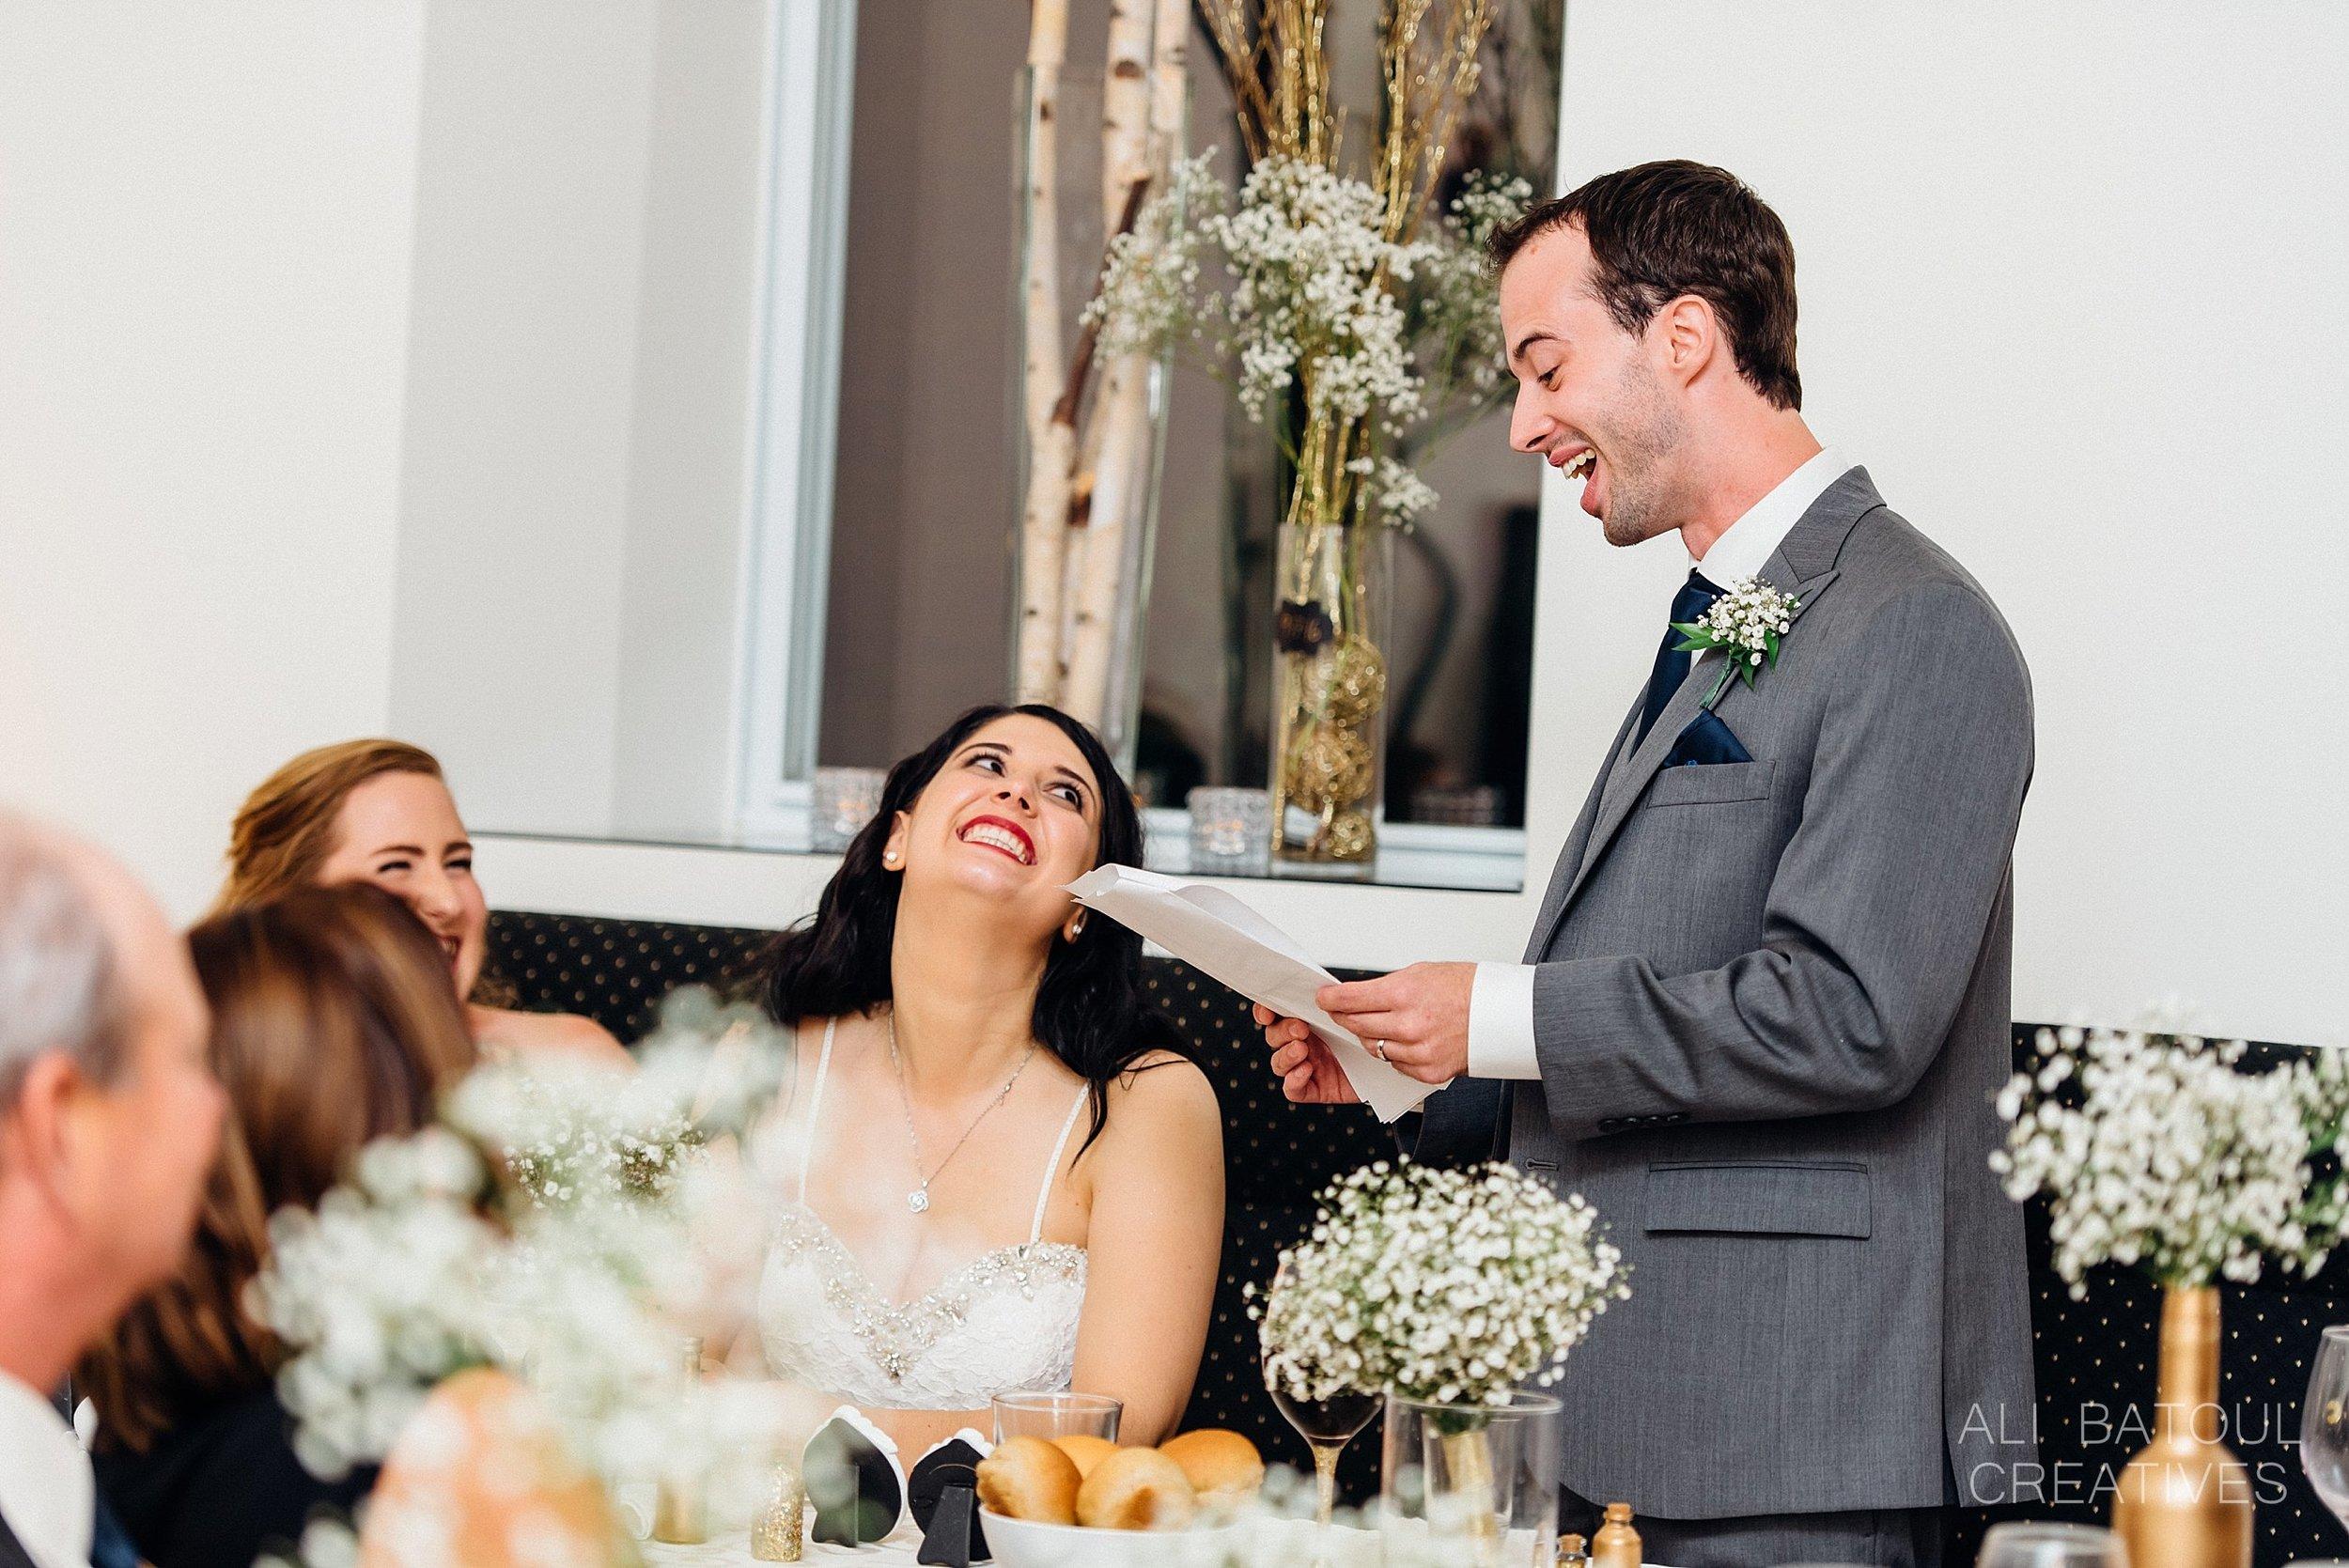 Jocelyn + Steve At The Schoolhouse Wedding - Ali and Batoul Fine Art Wedding Photography_0110.jpg